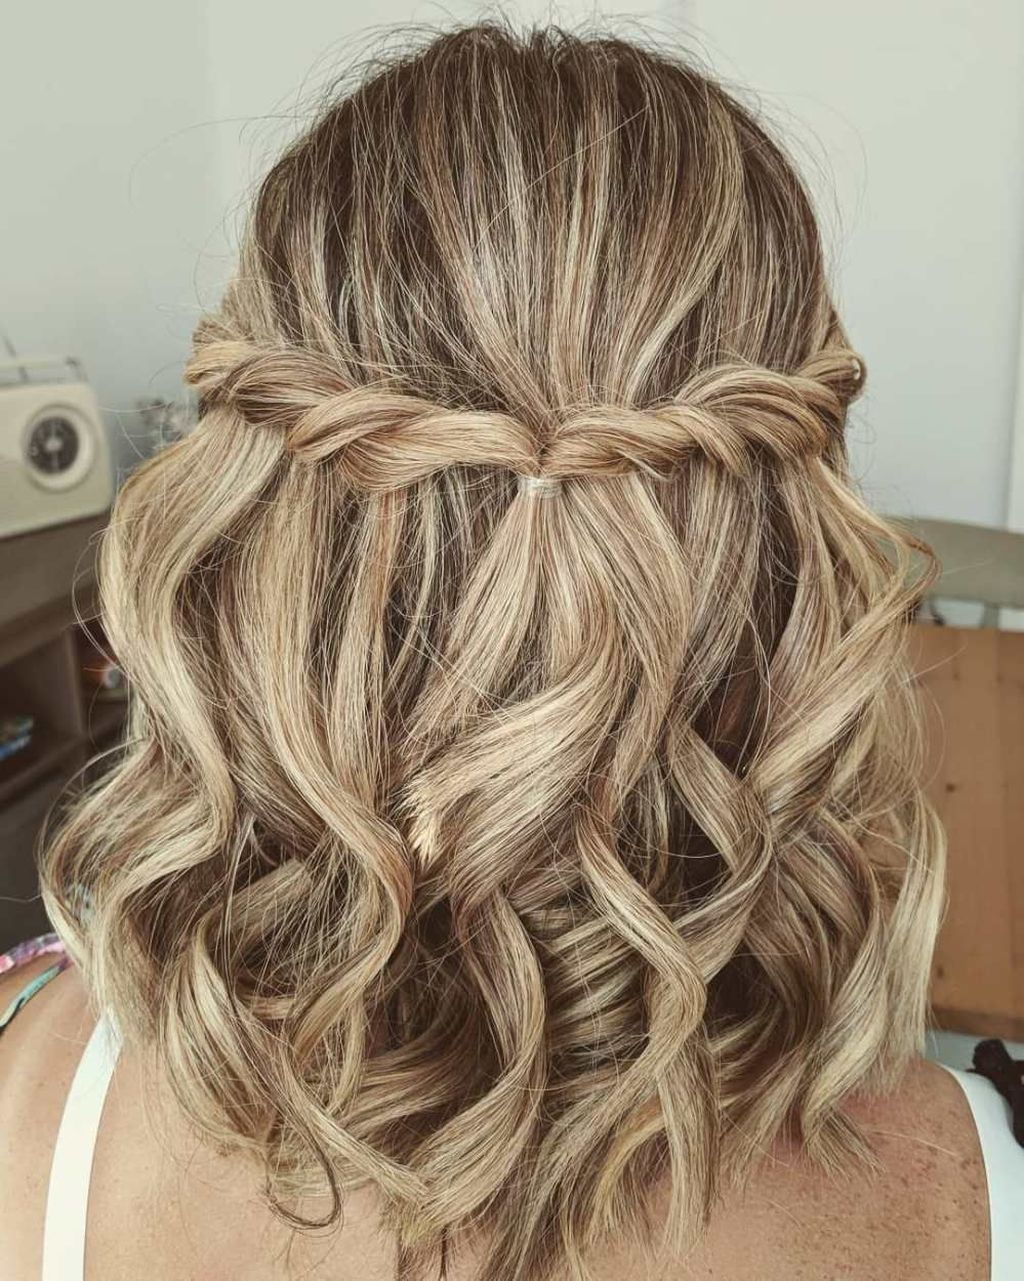 Coiffure Chignon Bas Hair Styles Short Hair Styles Curly Hair Styles